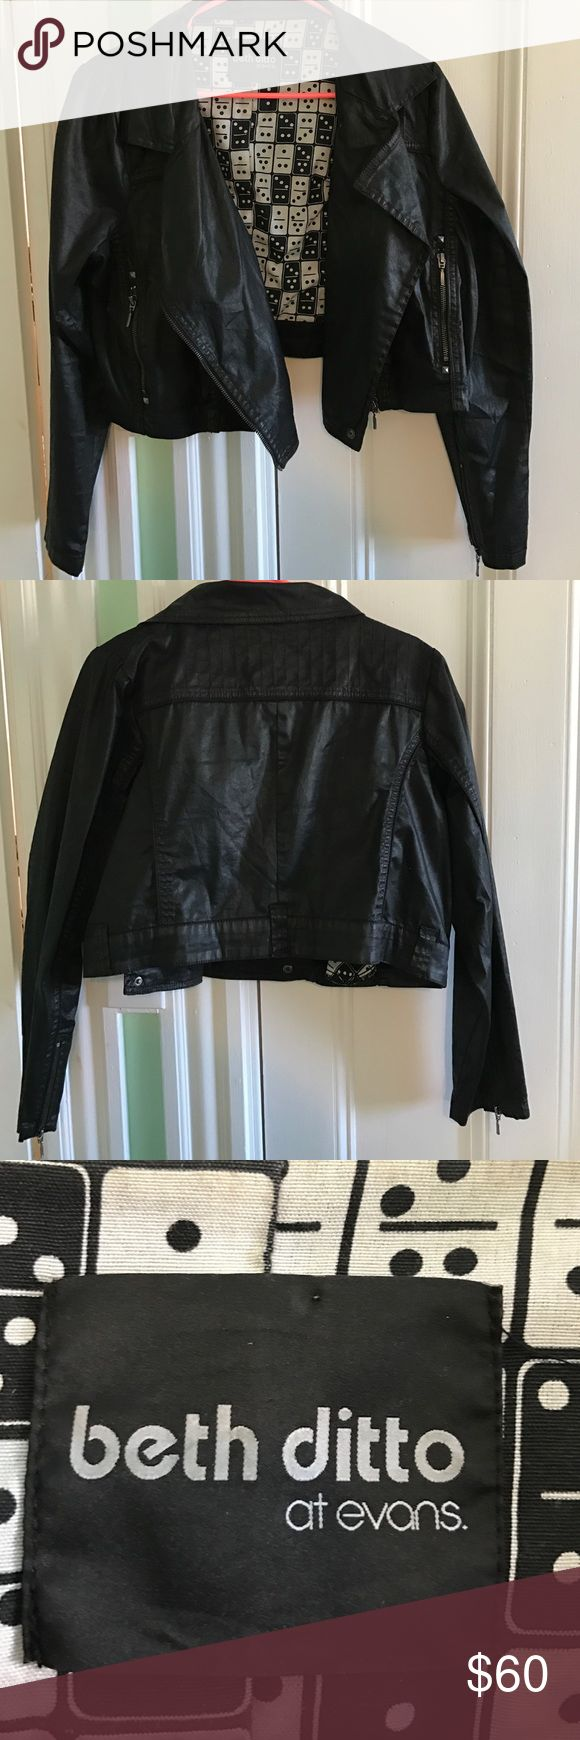 Beth Ditto for Evans cropped biker jacket Beth Ditto for Evans cropped biker jacket. Waxed cotton finish. Pockets. Domino print lining. Rare! UK20/US16 Evans Jackets & Coats